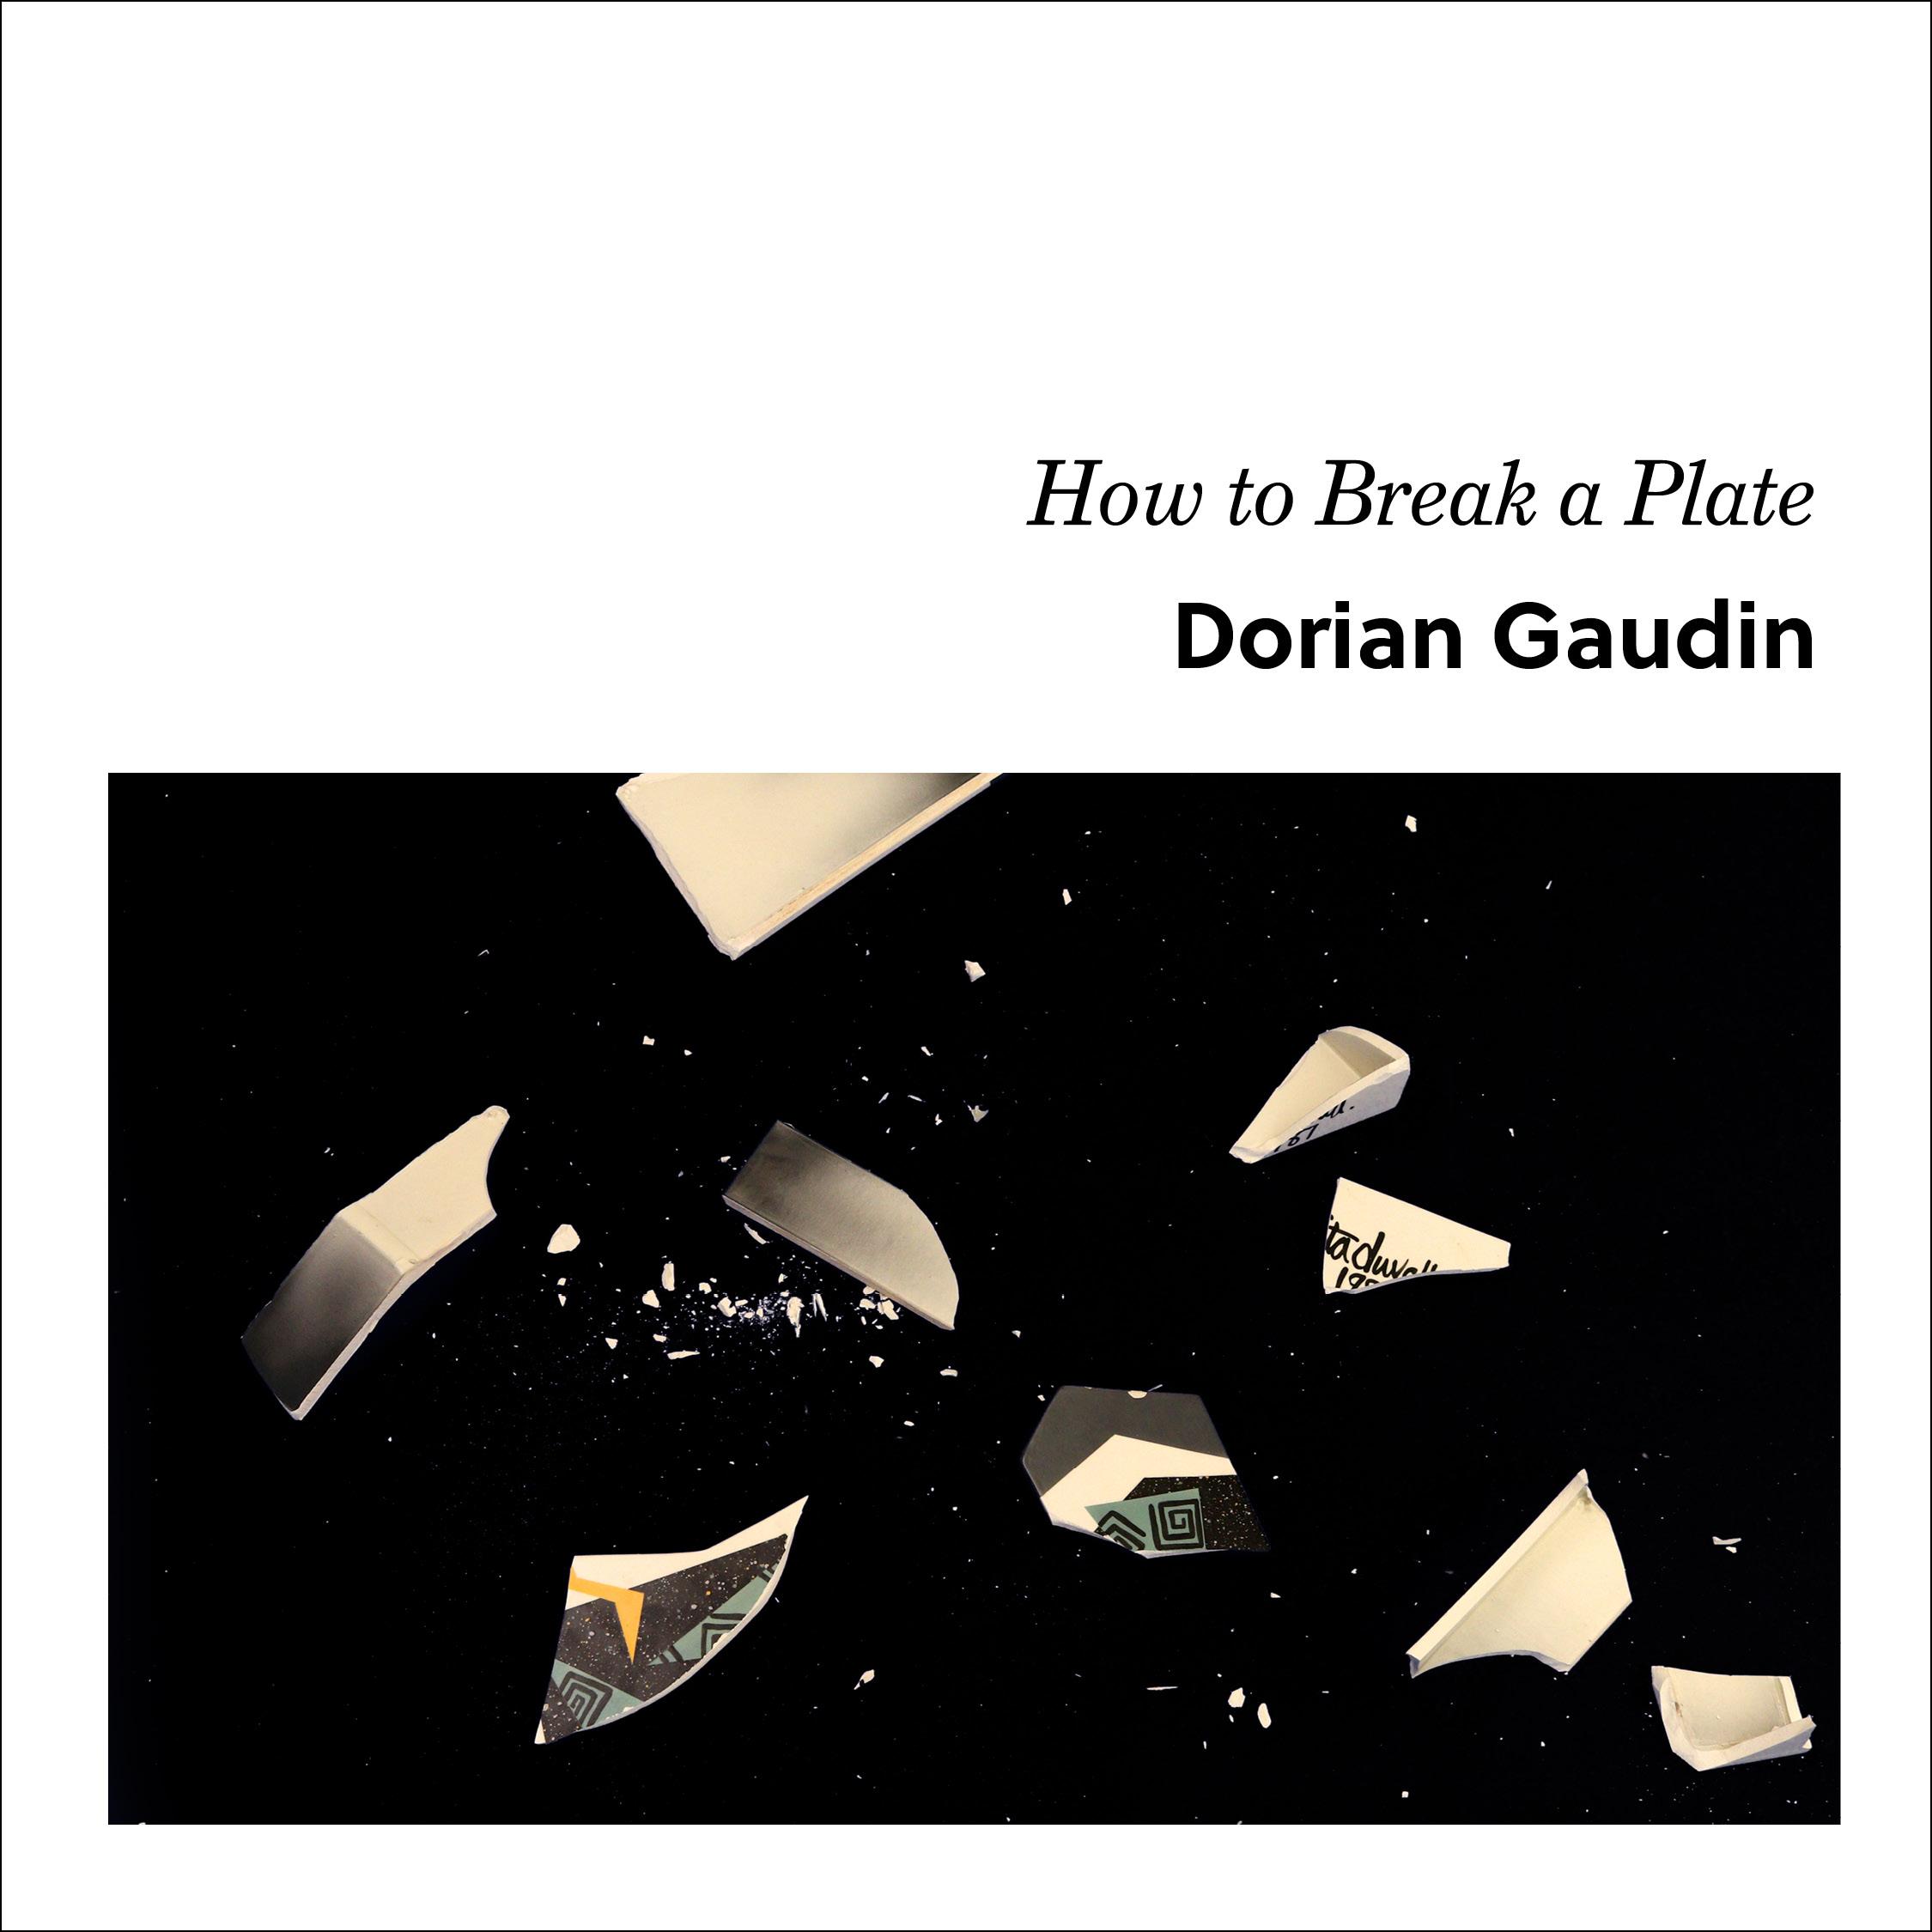 Week 2: Dorian Gaudin